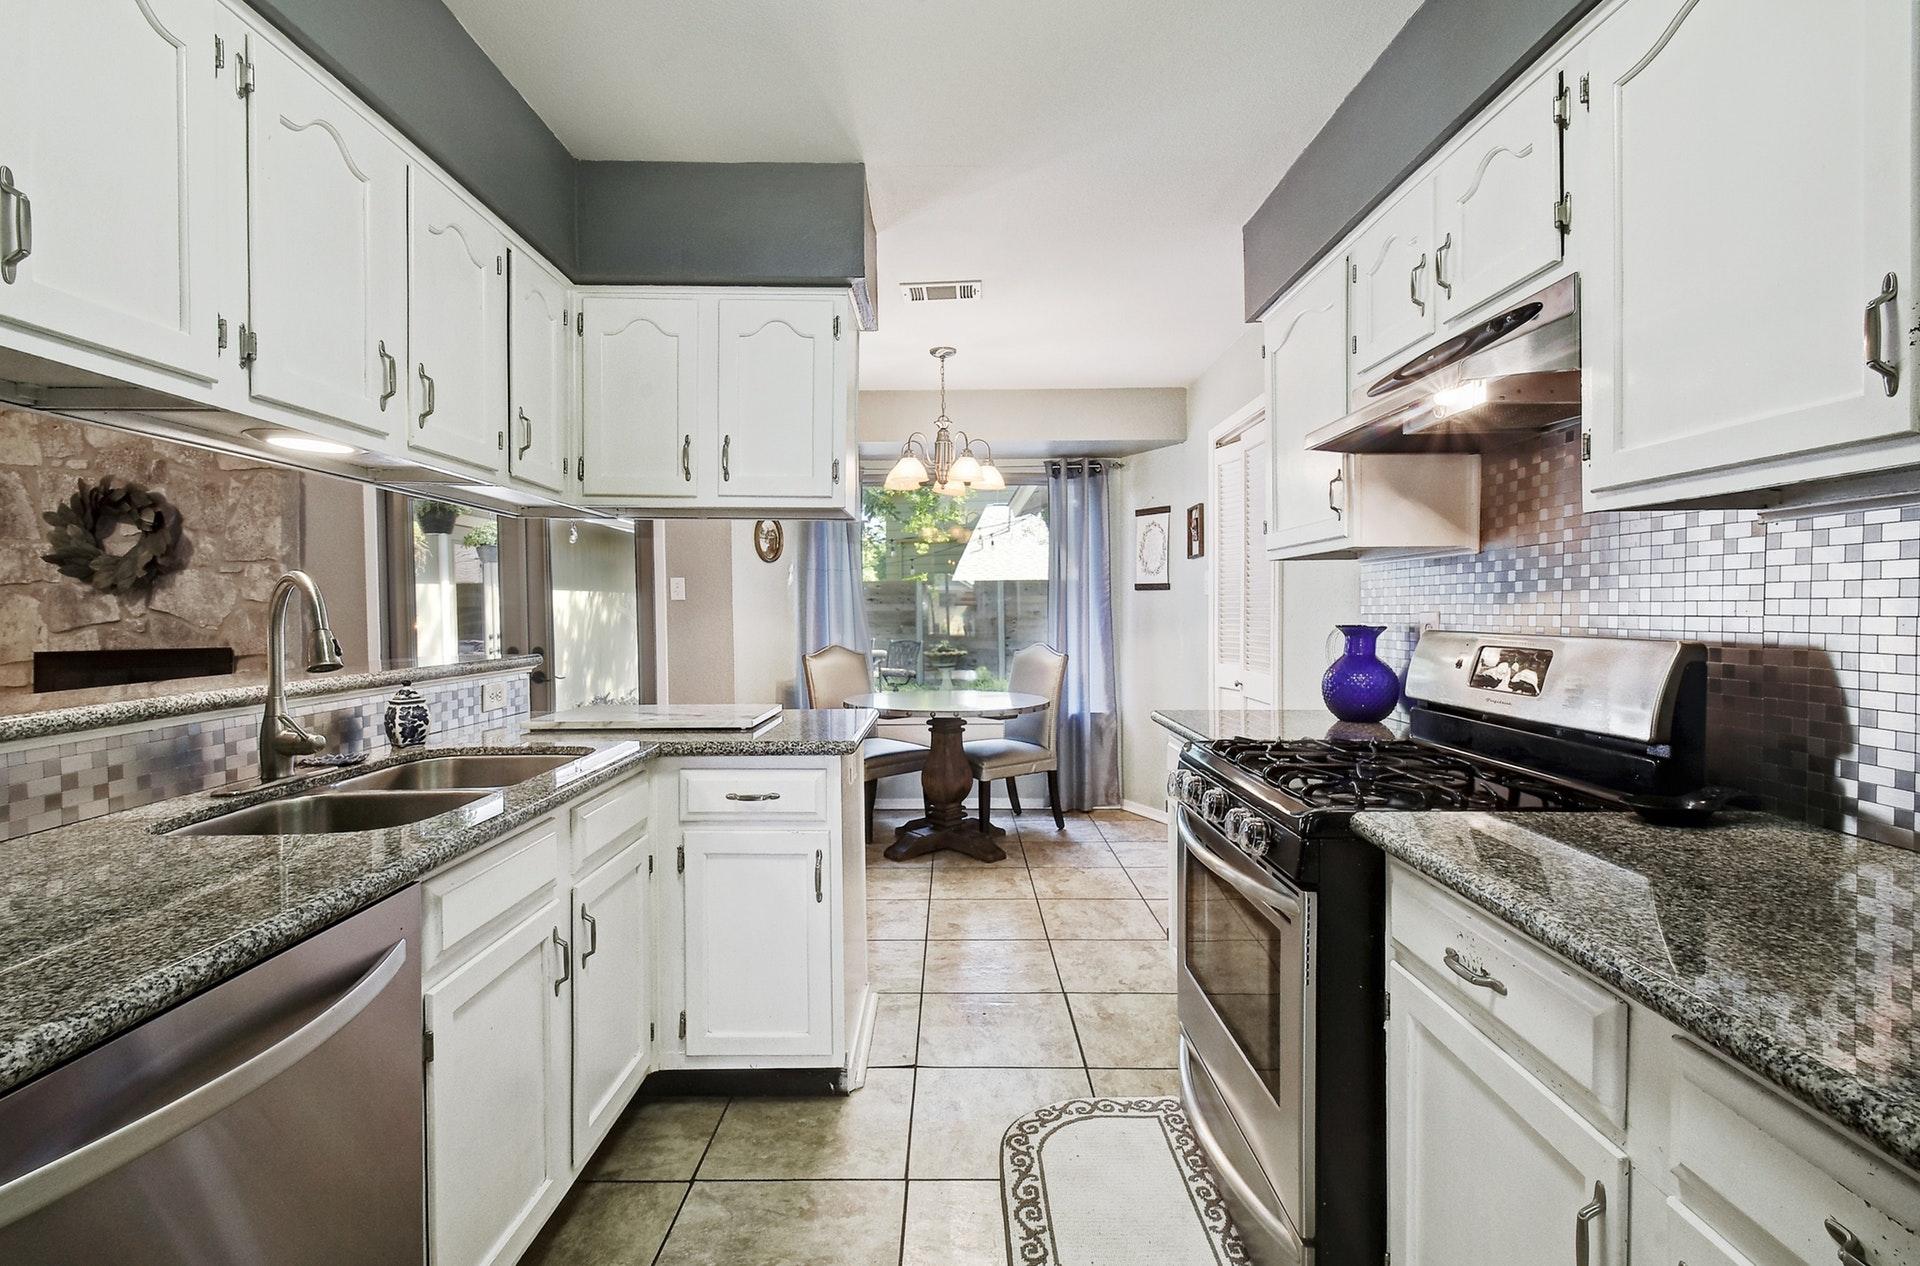 2300 Lear Lane - Kitchen & Dining 2